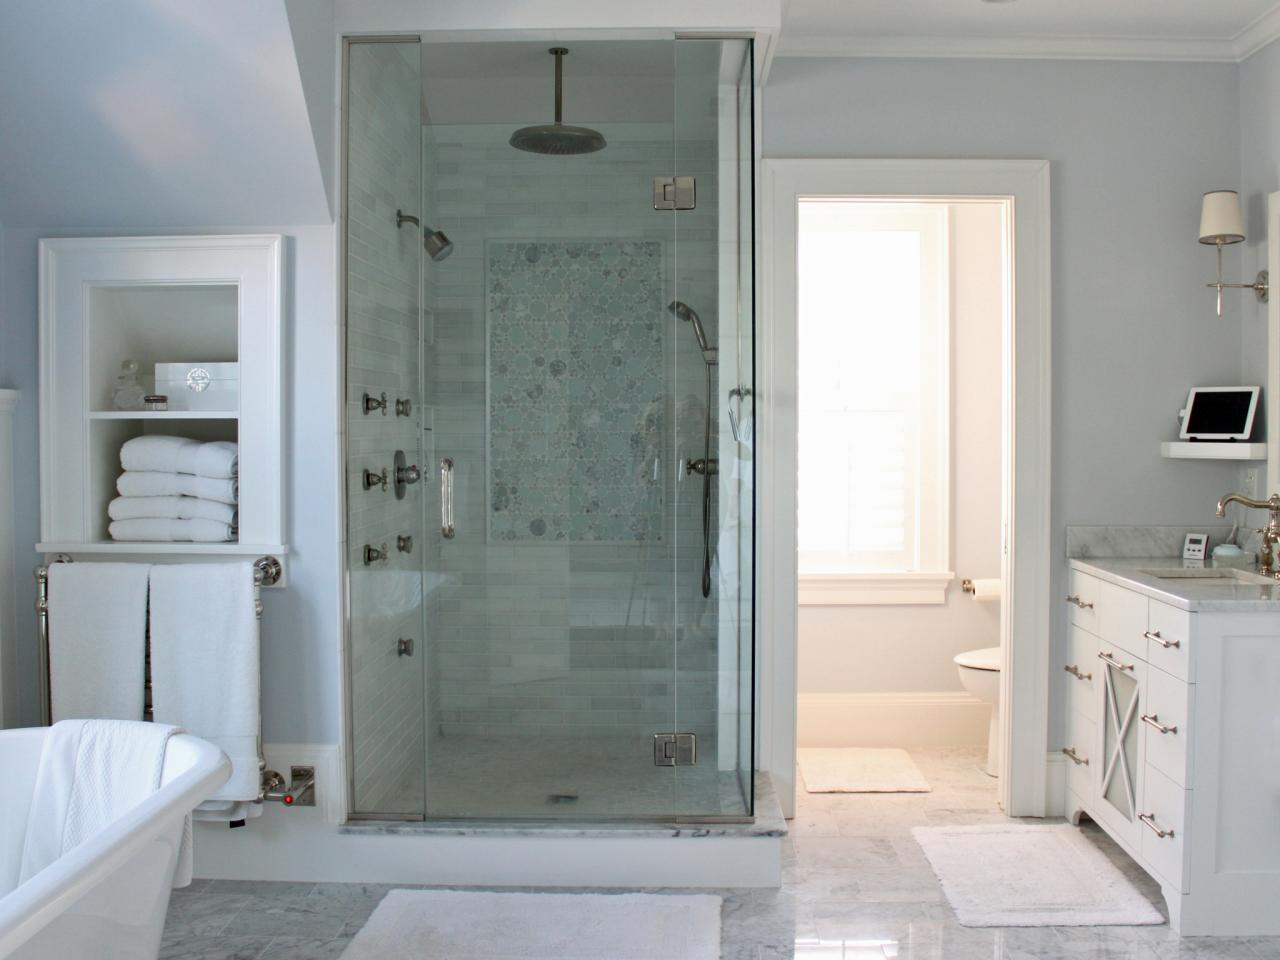 Spa Retreat Bathroom Ideas Part - 23: Spa Bathroom Design Waterfront Retreat